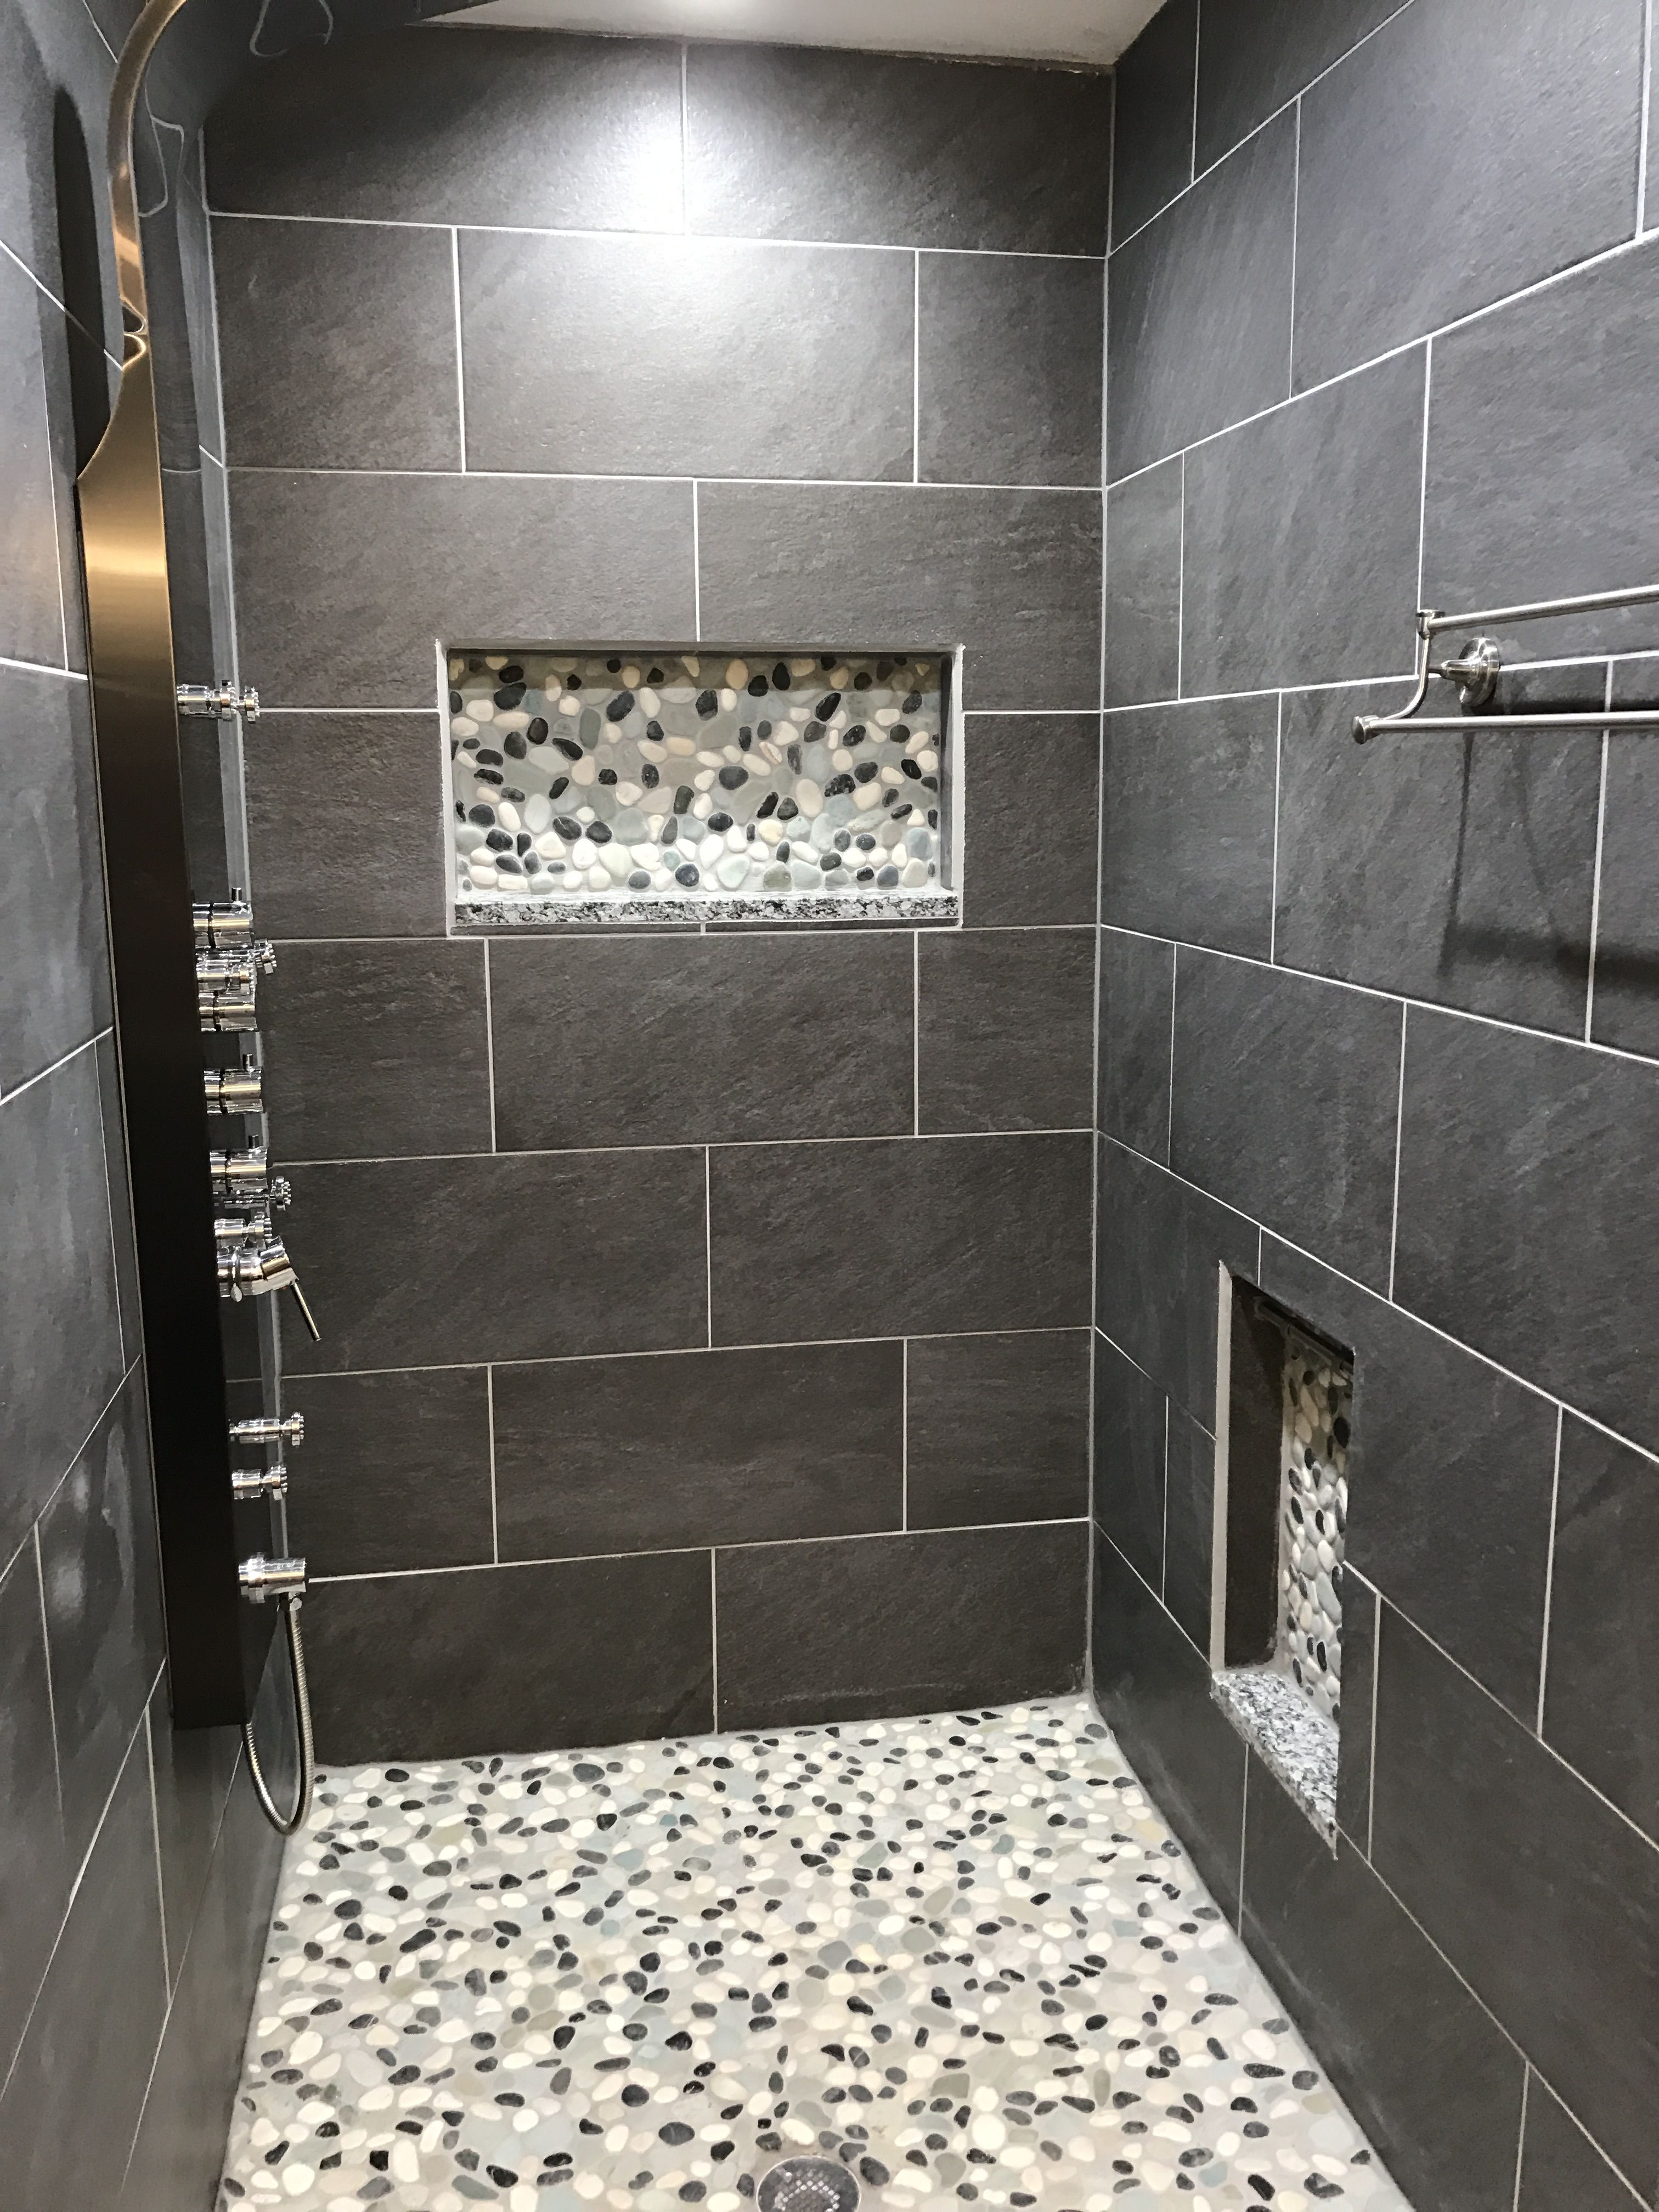 Bali Turtle Pebble Tile Best Bathroom Tiles Bathroom Remodel Cost Bathroom Remodel Shower